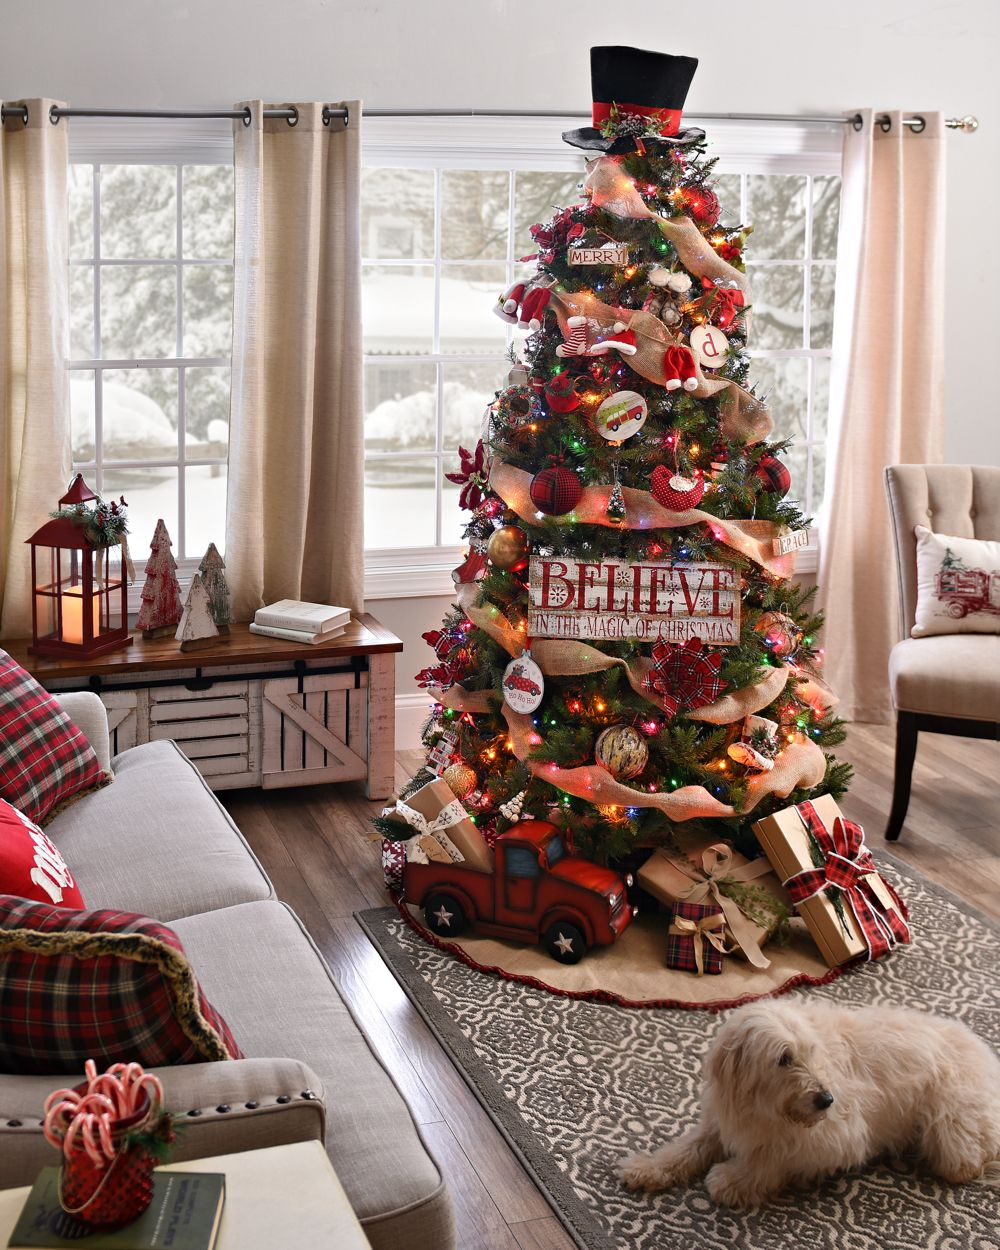 Choosing Your Christmas Tree Theme | Decorating for Christmas ...